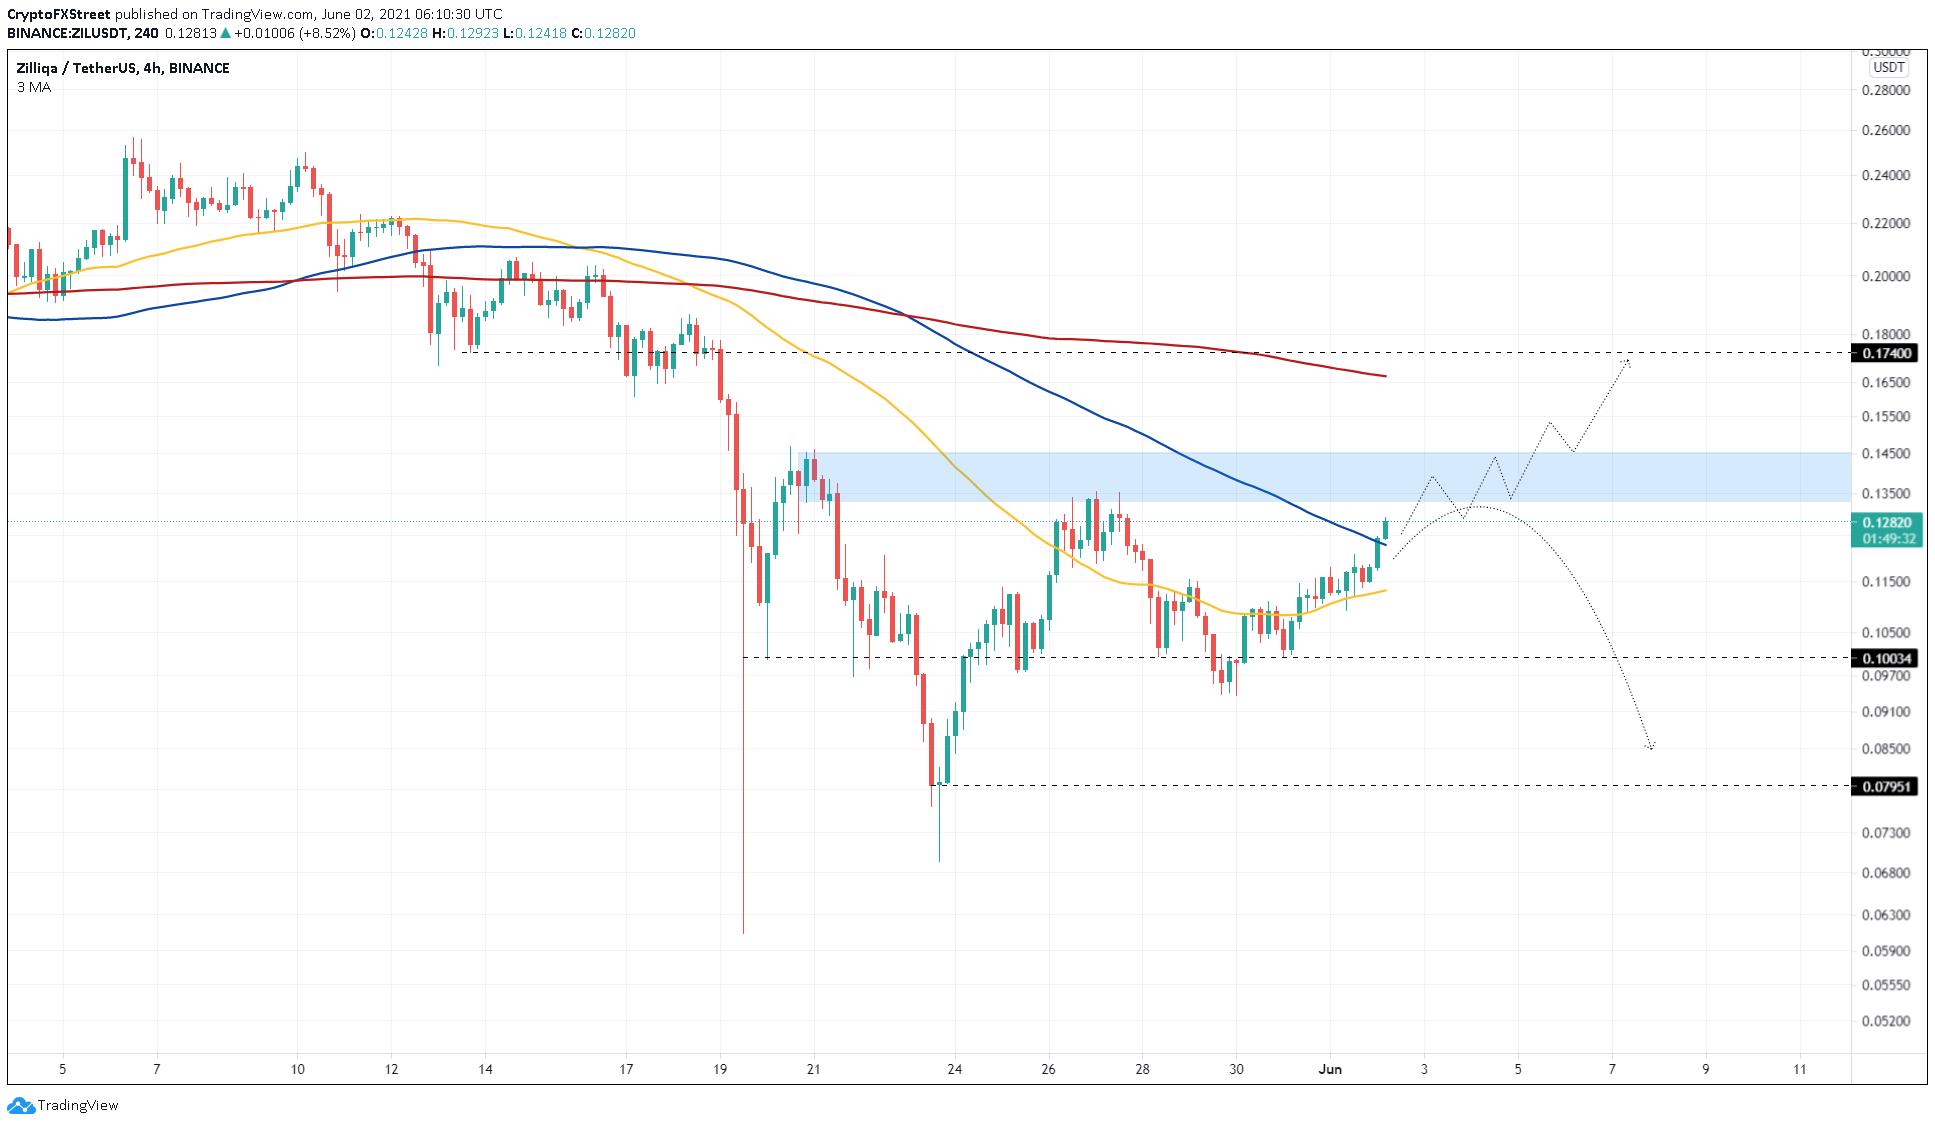 ZIL/USDT 4-hour chart